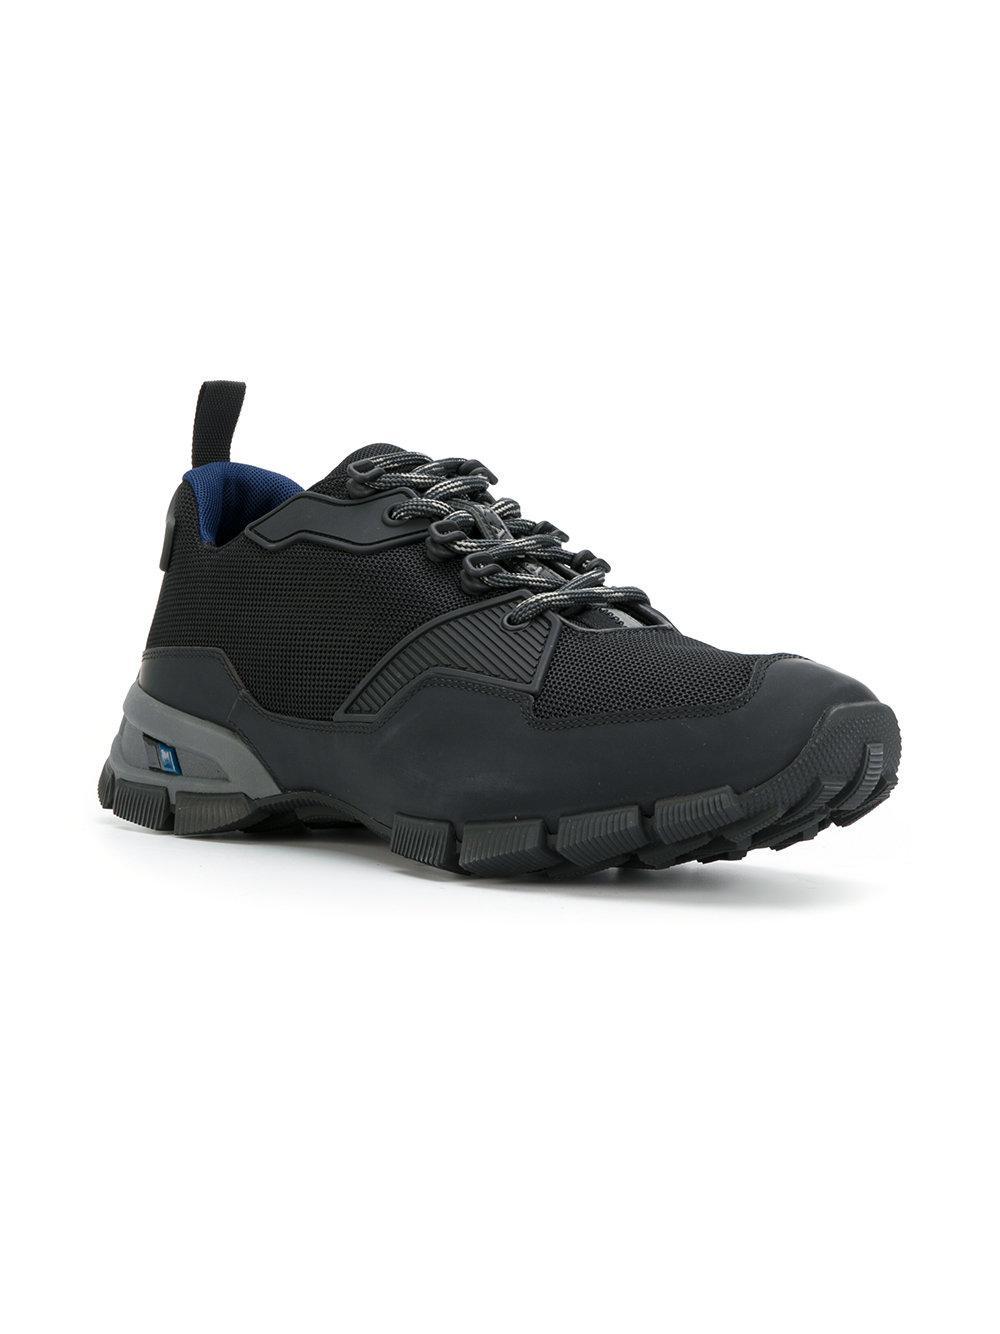 eaa909bf8dbb Lyst - Prada Ridged Sole Sneakers in Black for Men